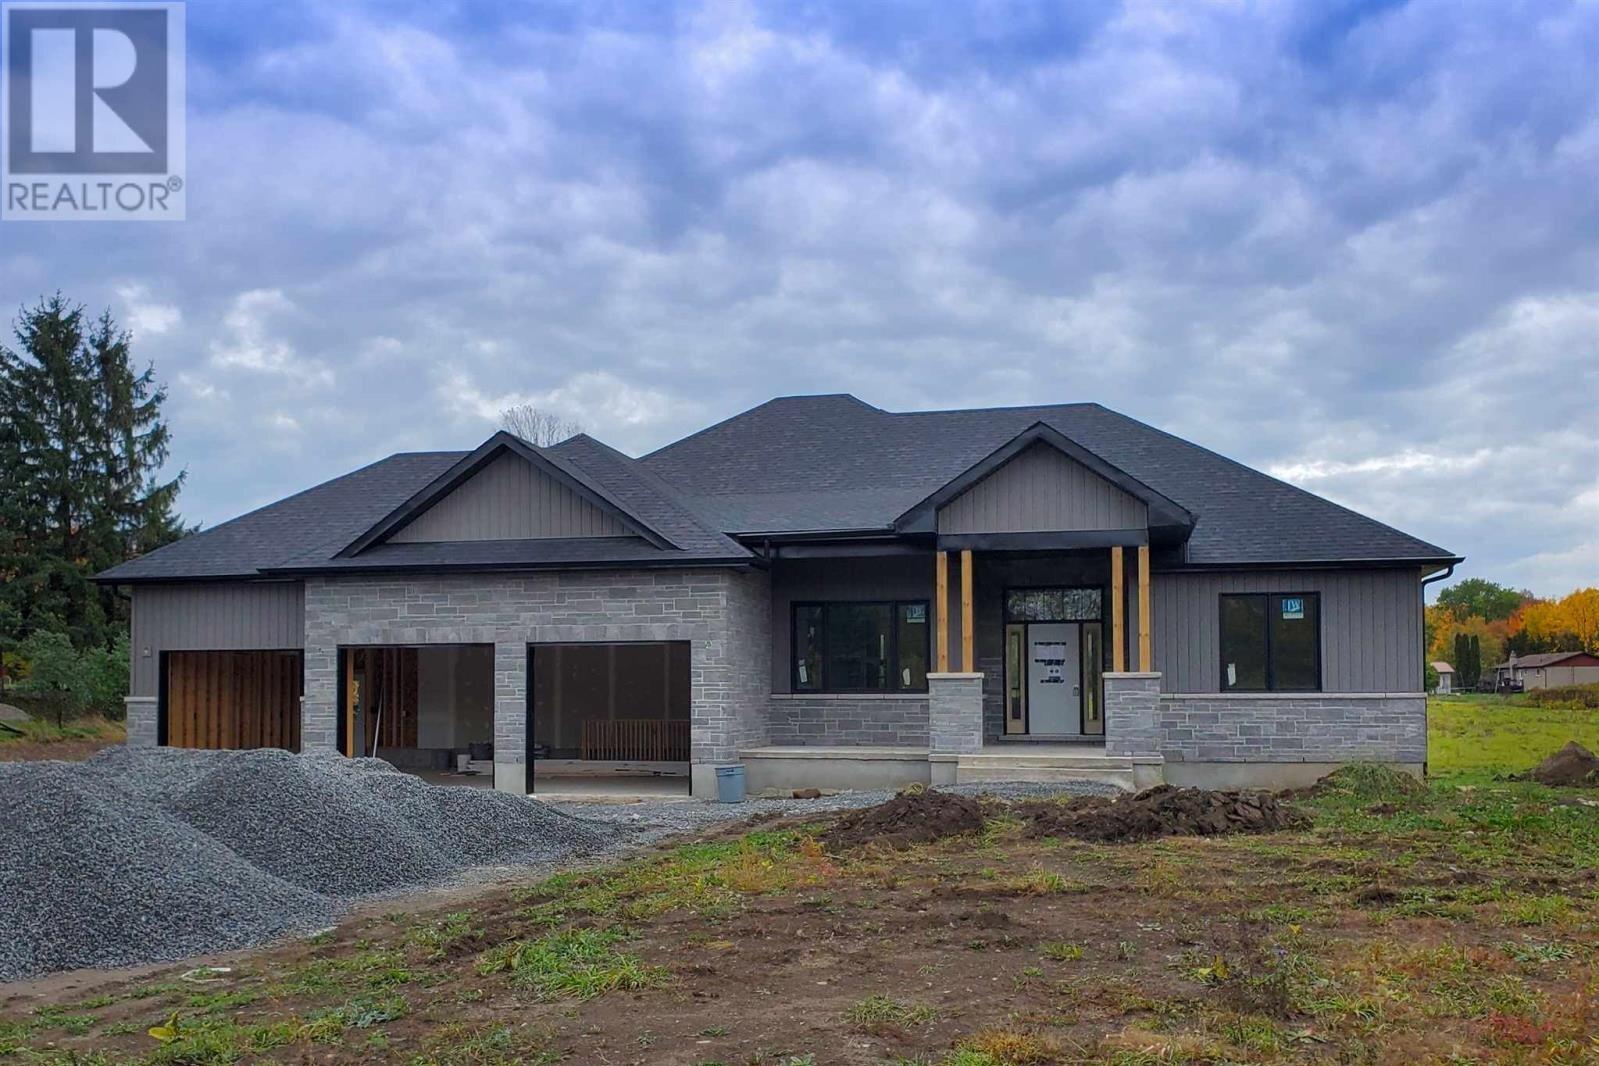 House for sale at 4119 Moreland Dixon Rd South Frontenac Ontario - MLS: K20003867